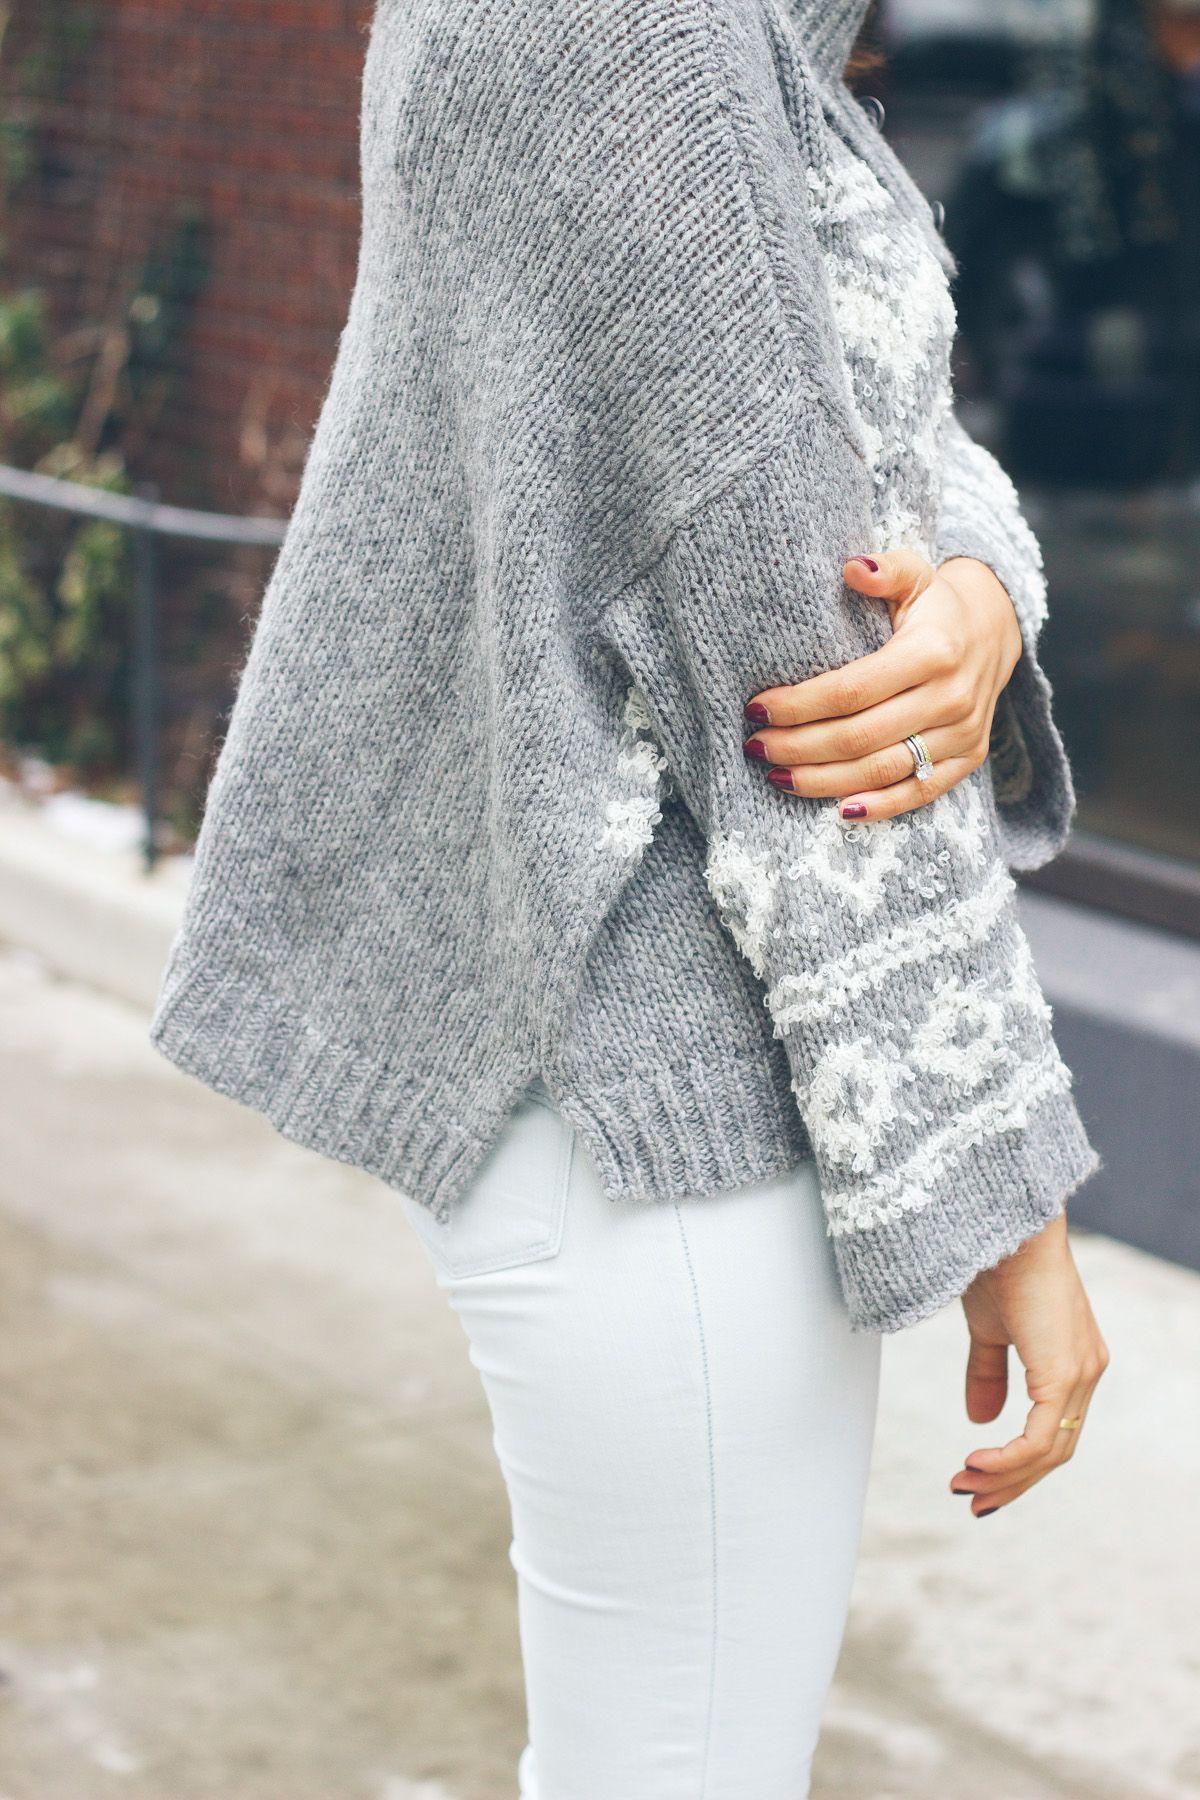 free people sweater, fair aisle sweater @zappos